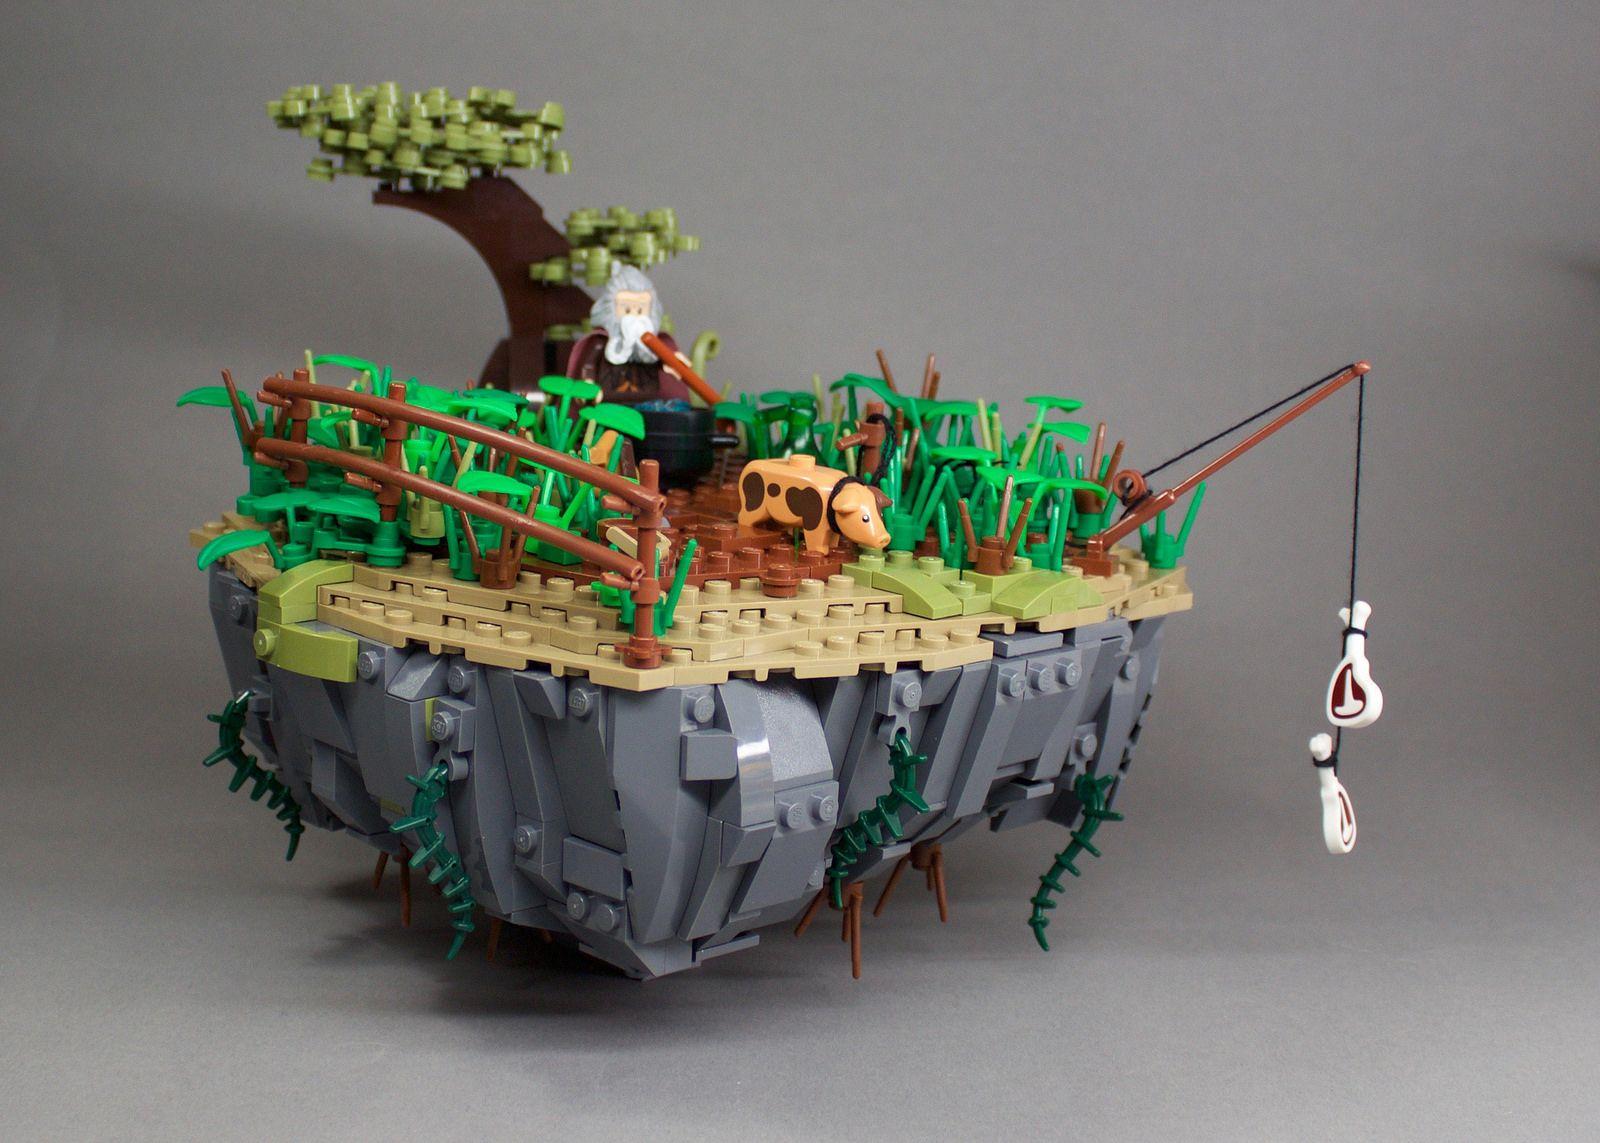 The Lost Dragonhunter